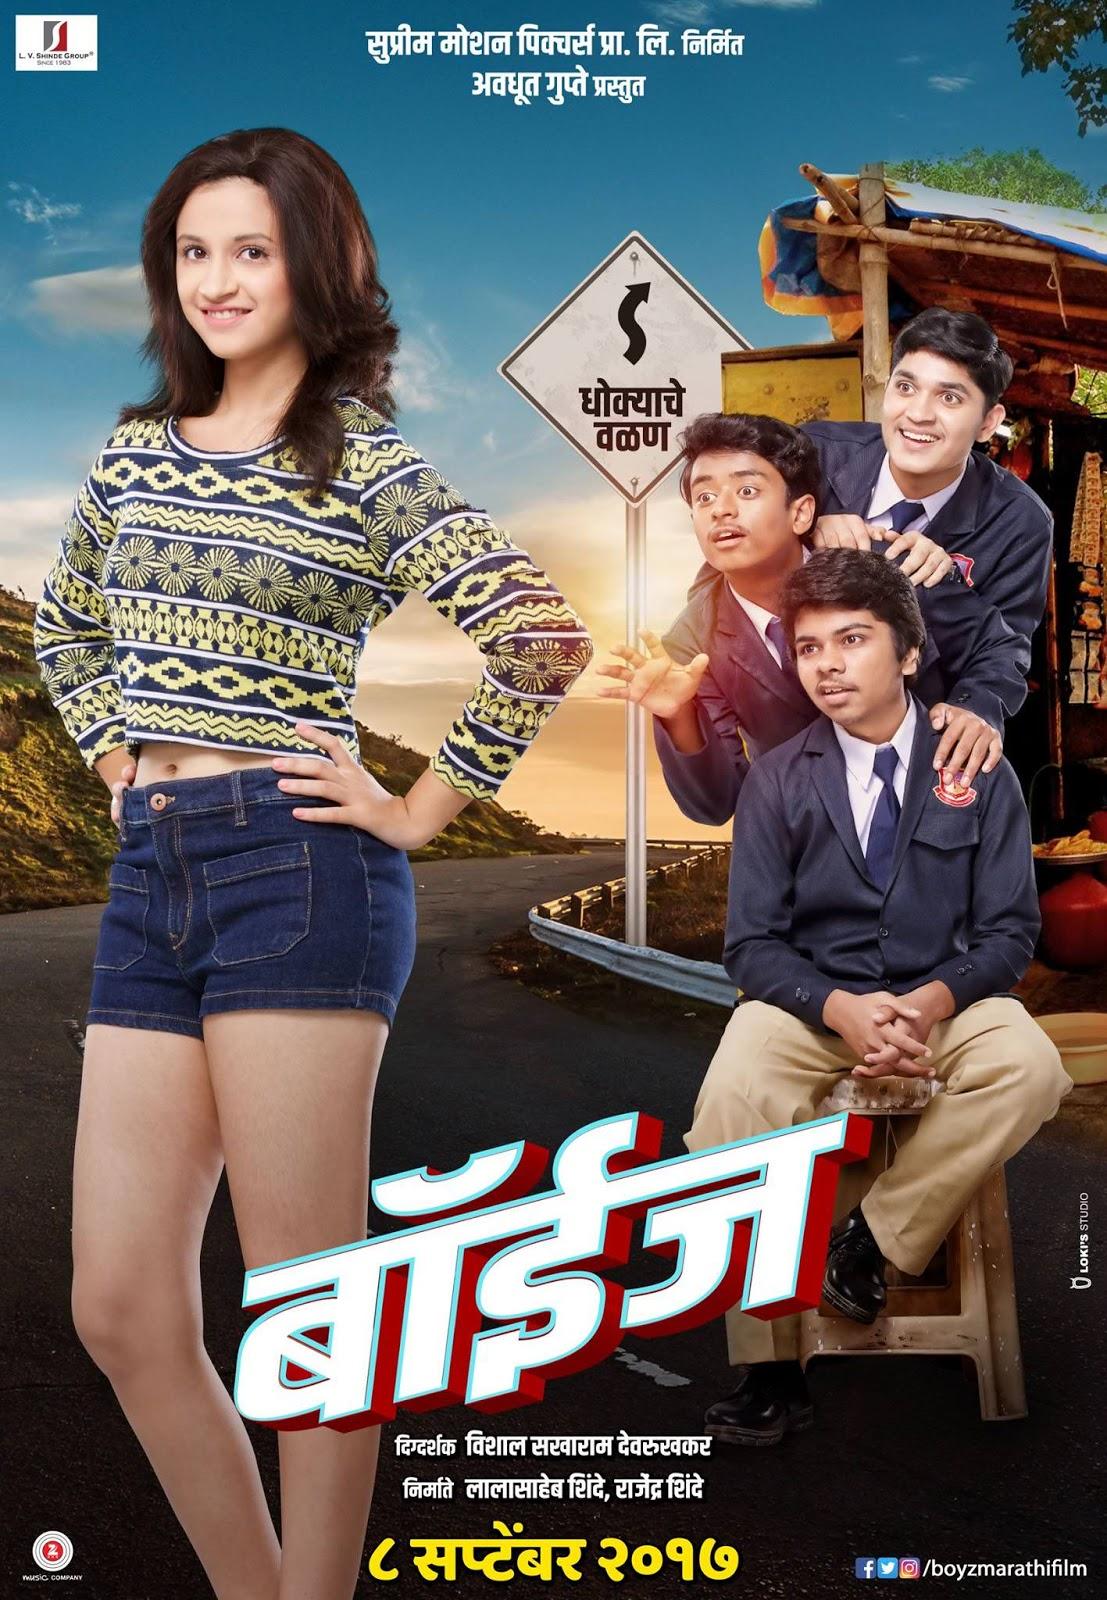 Boyz Marathi Movie Cast And Crew